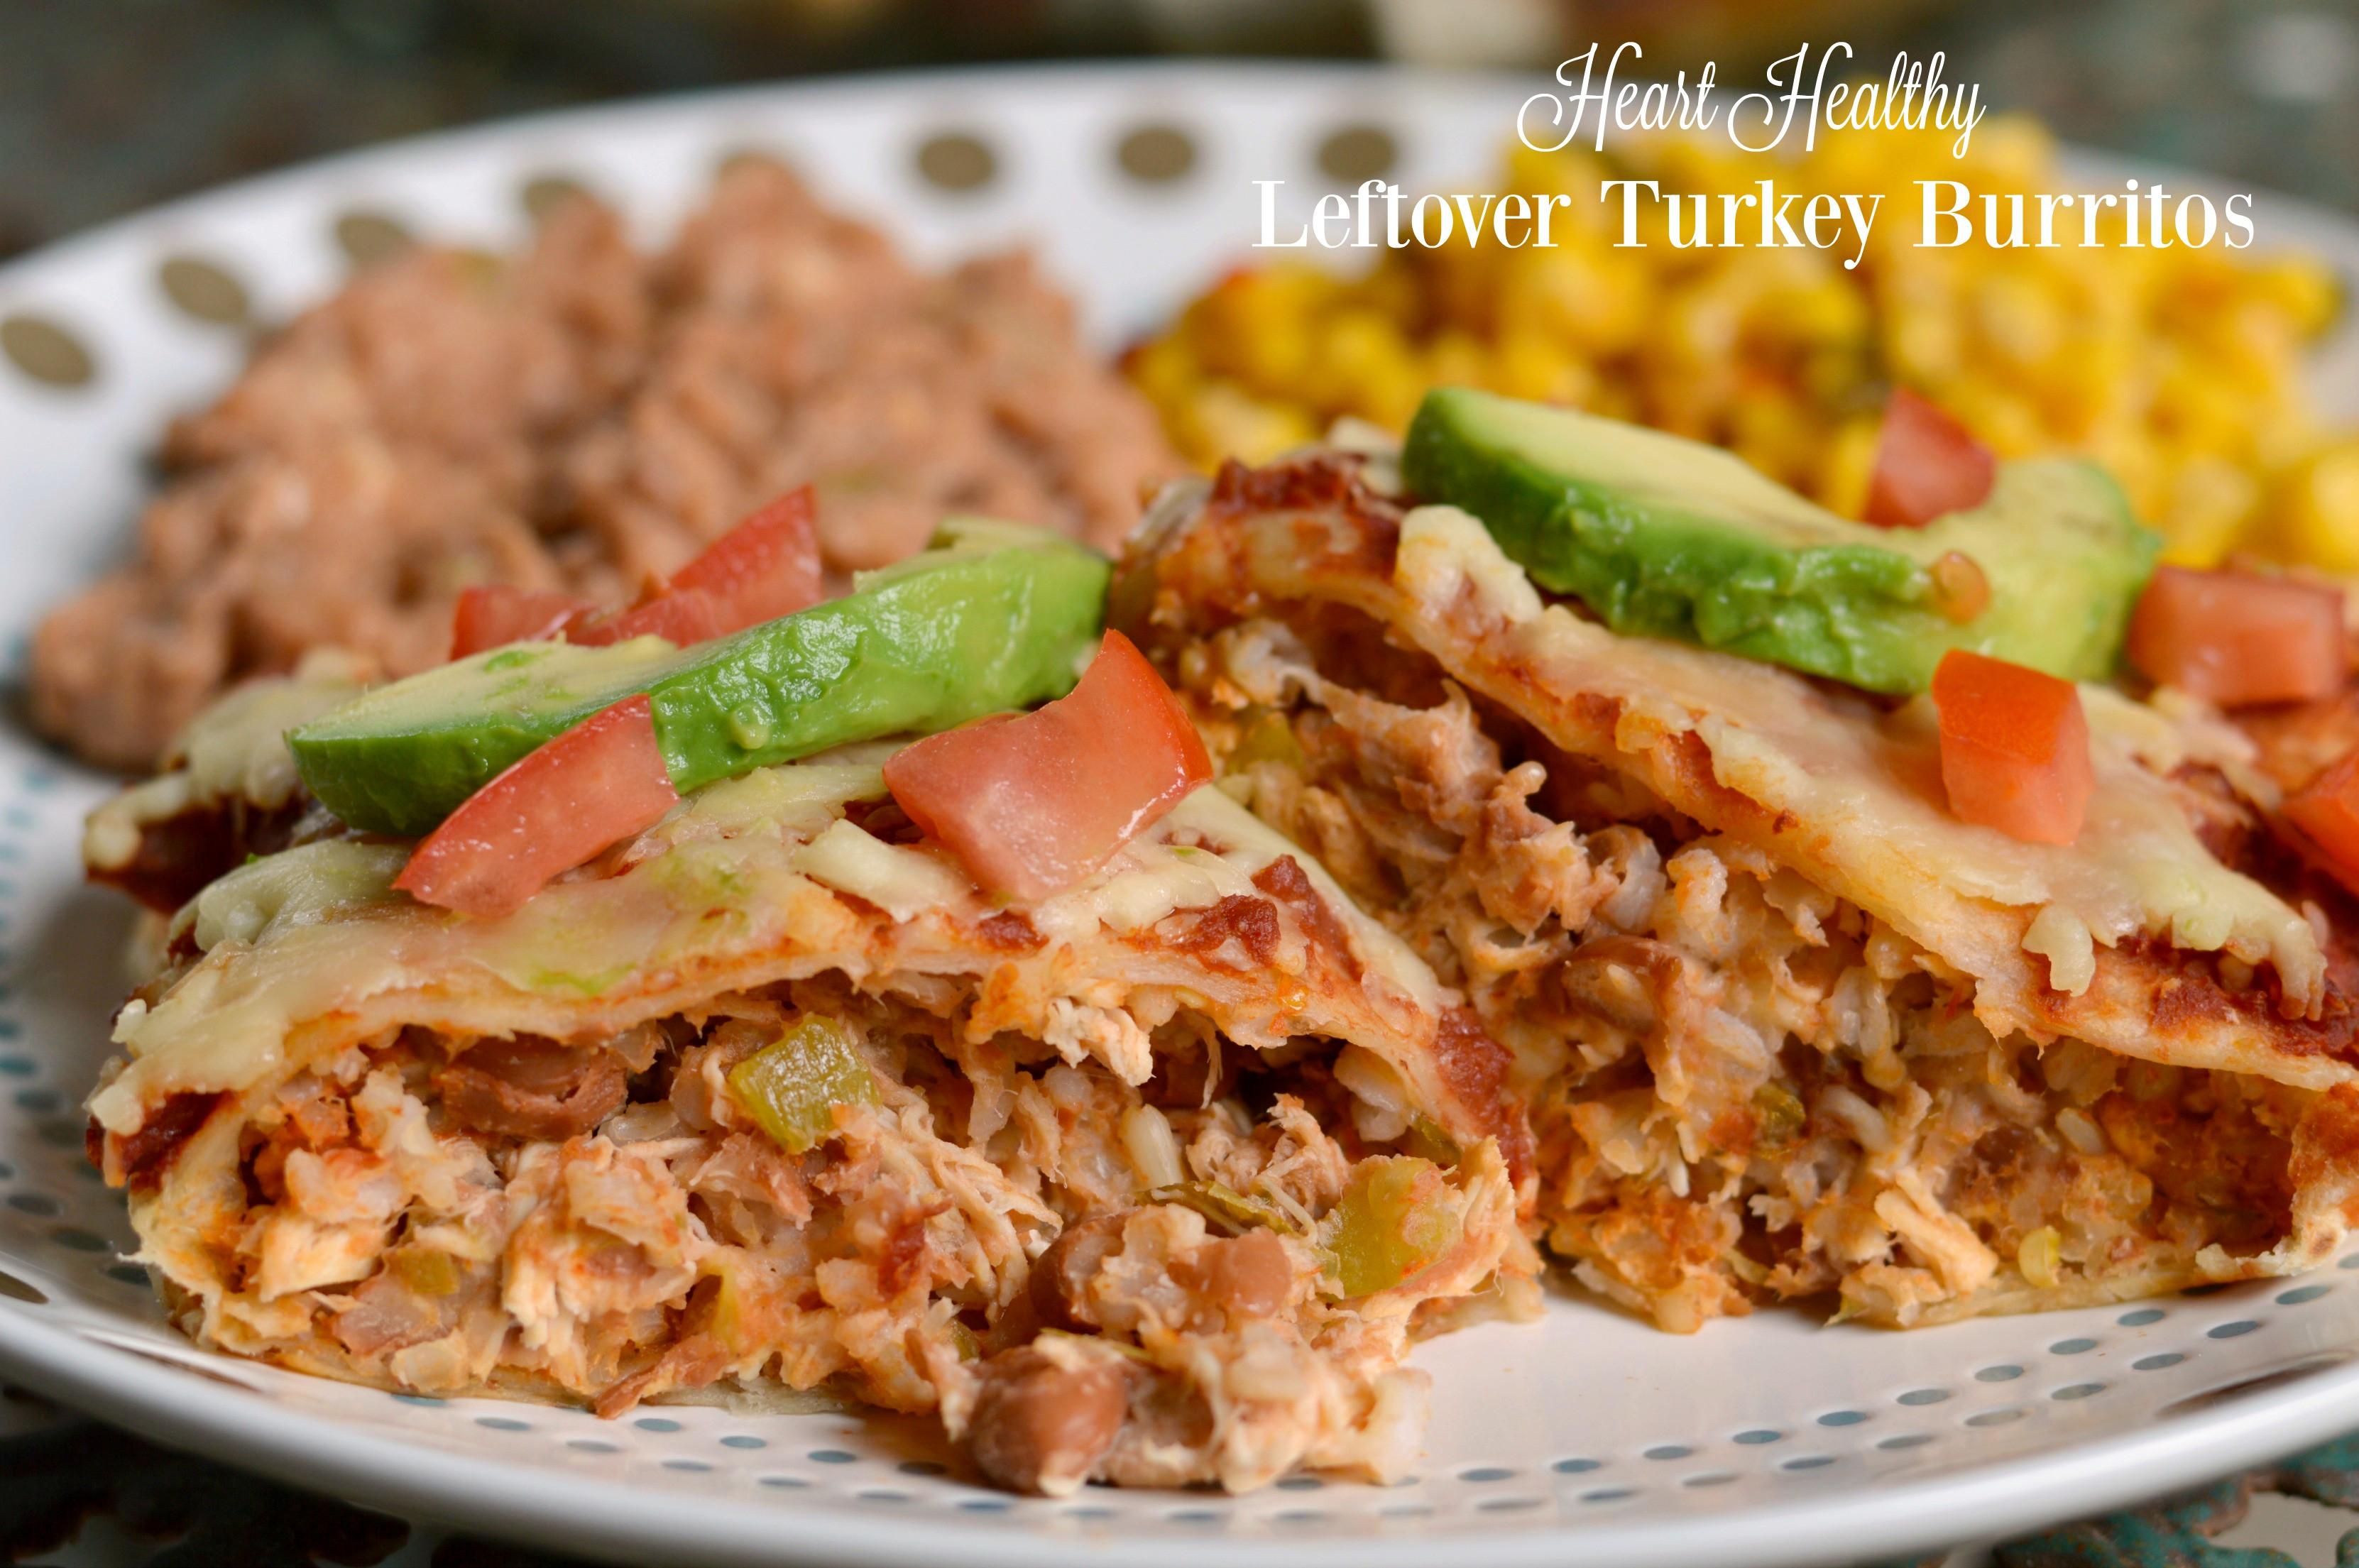 Heart Healthy Thanksgiving Recipes  Heart Healthy Leftover Turkey Burritos Recipe SoFabFood